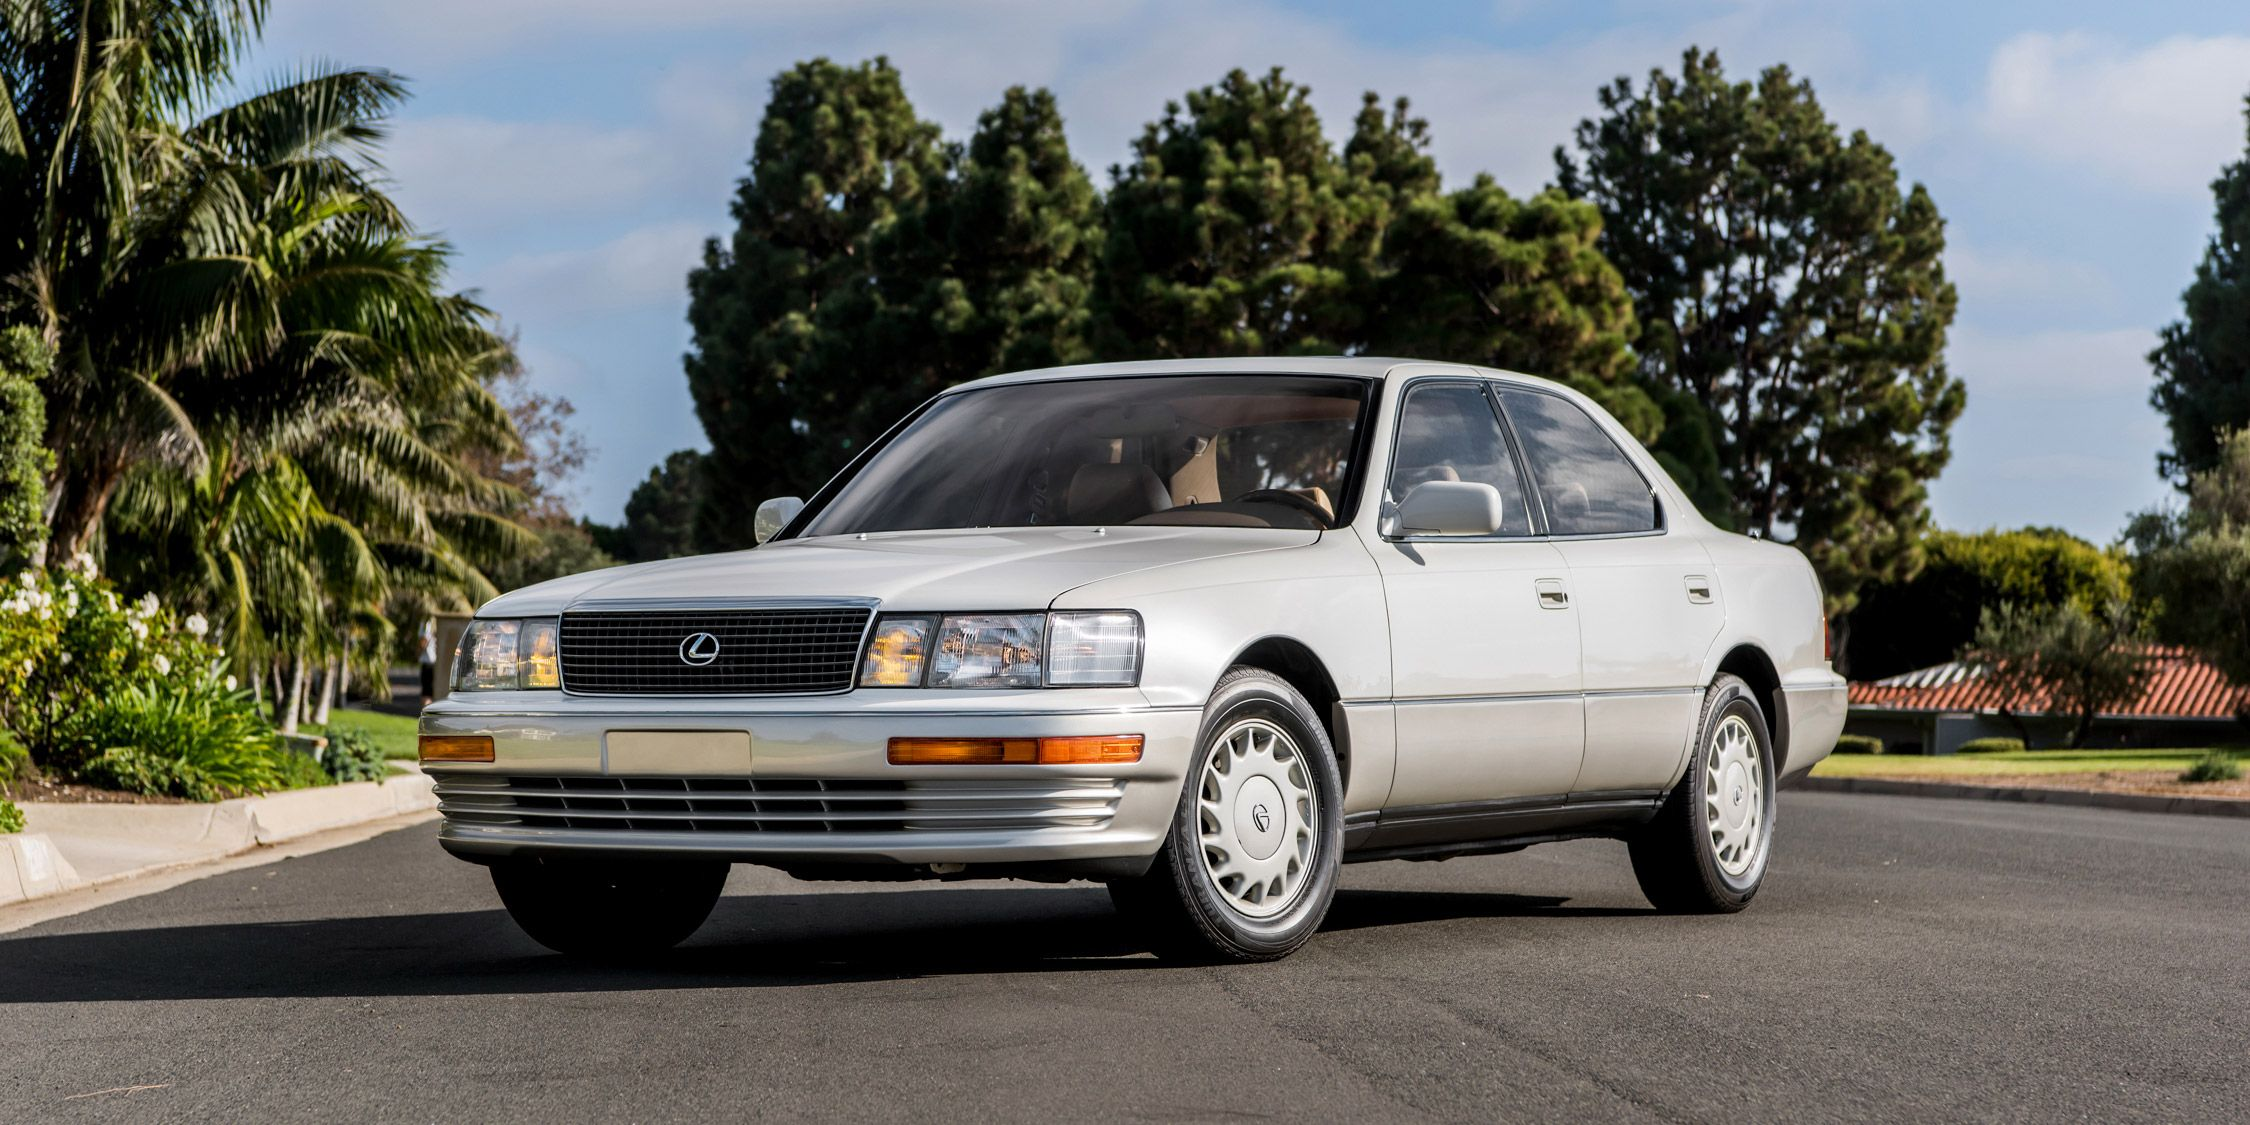 Luxury Japan Style Revisiting The Original Lexus Ls400 Feature